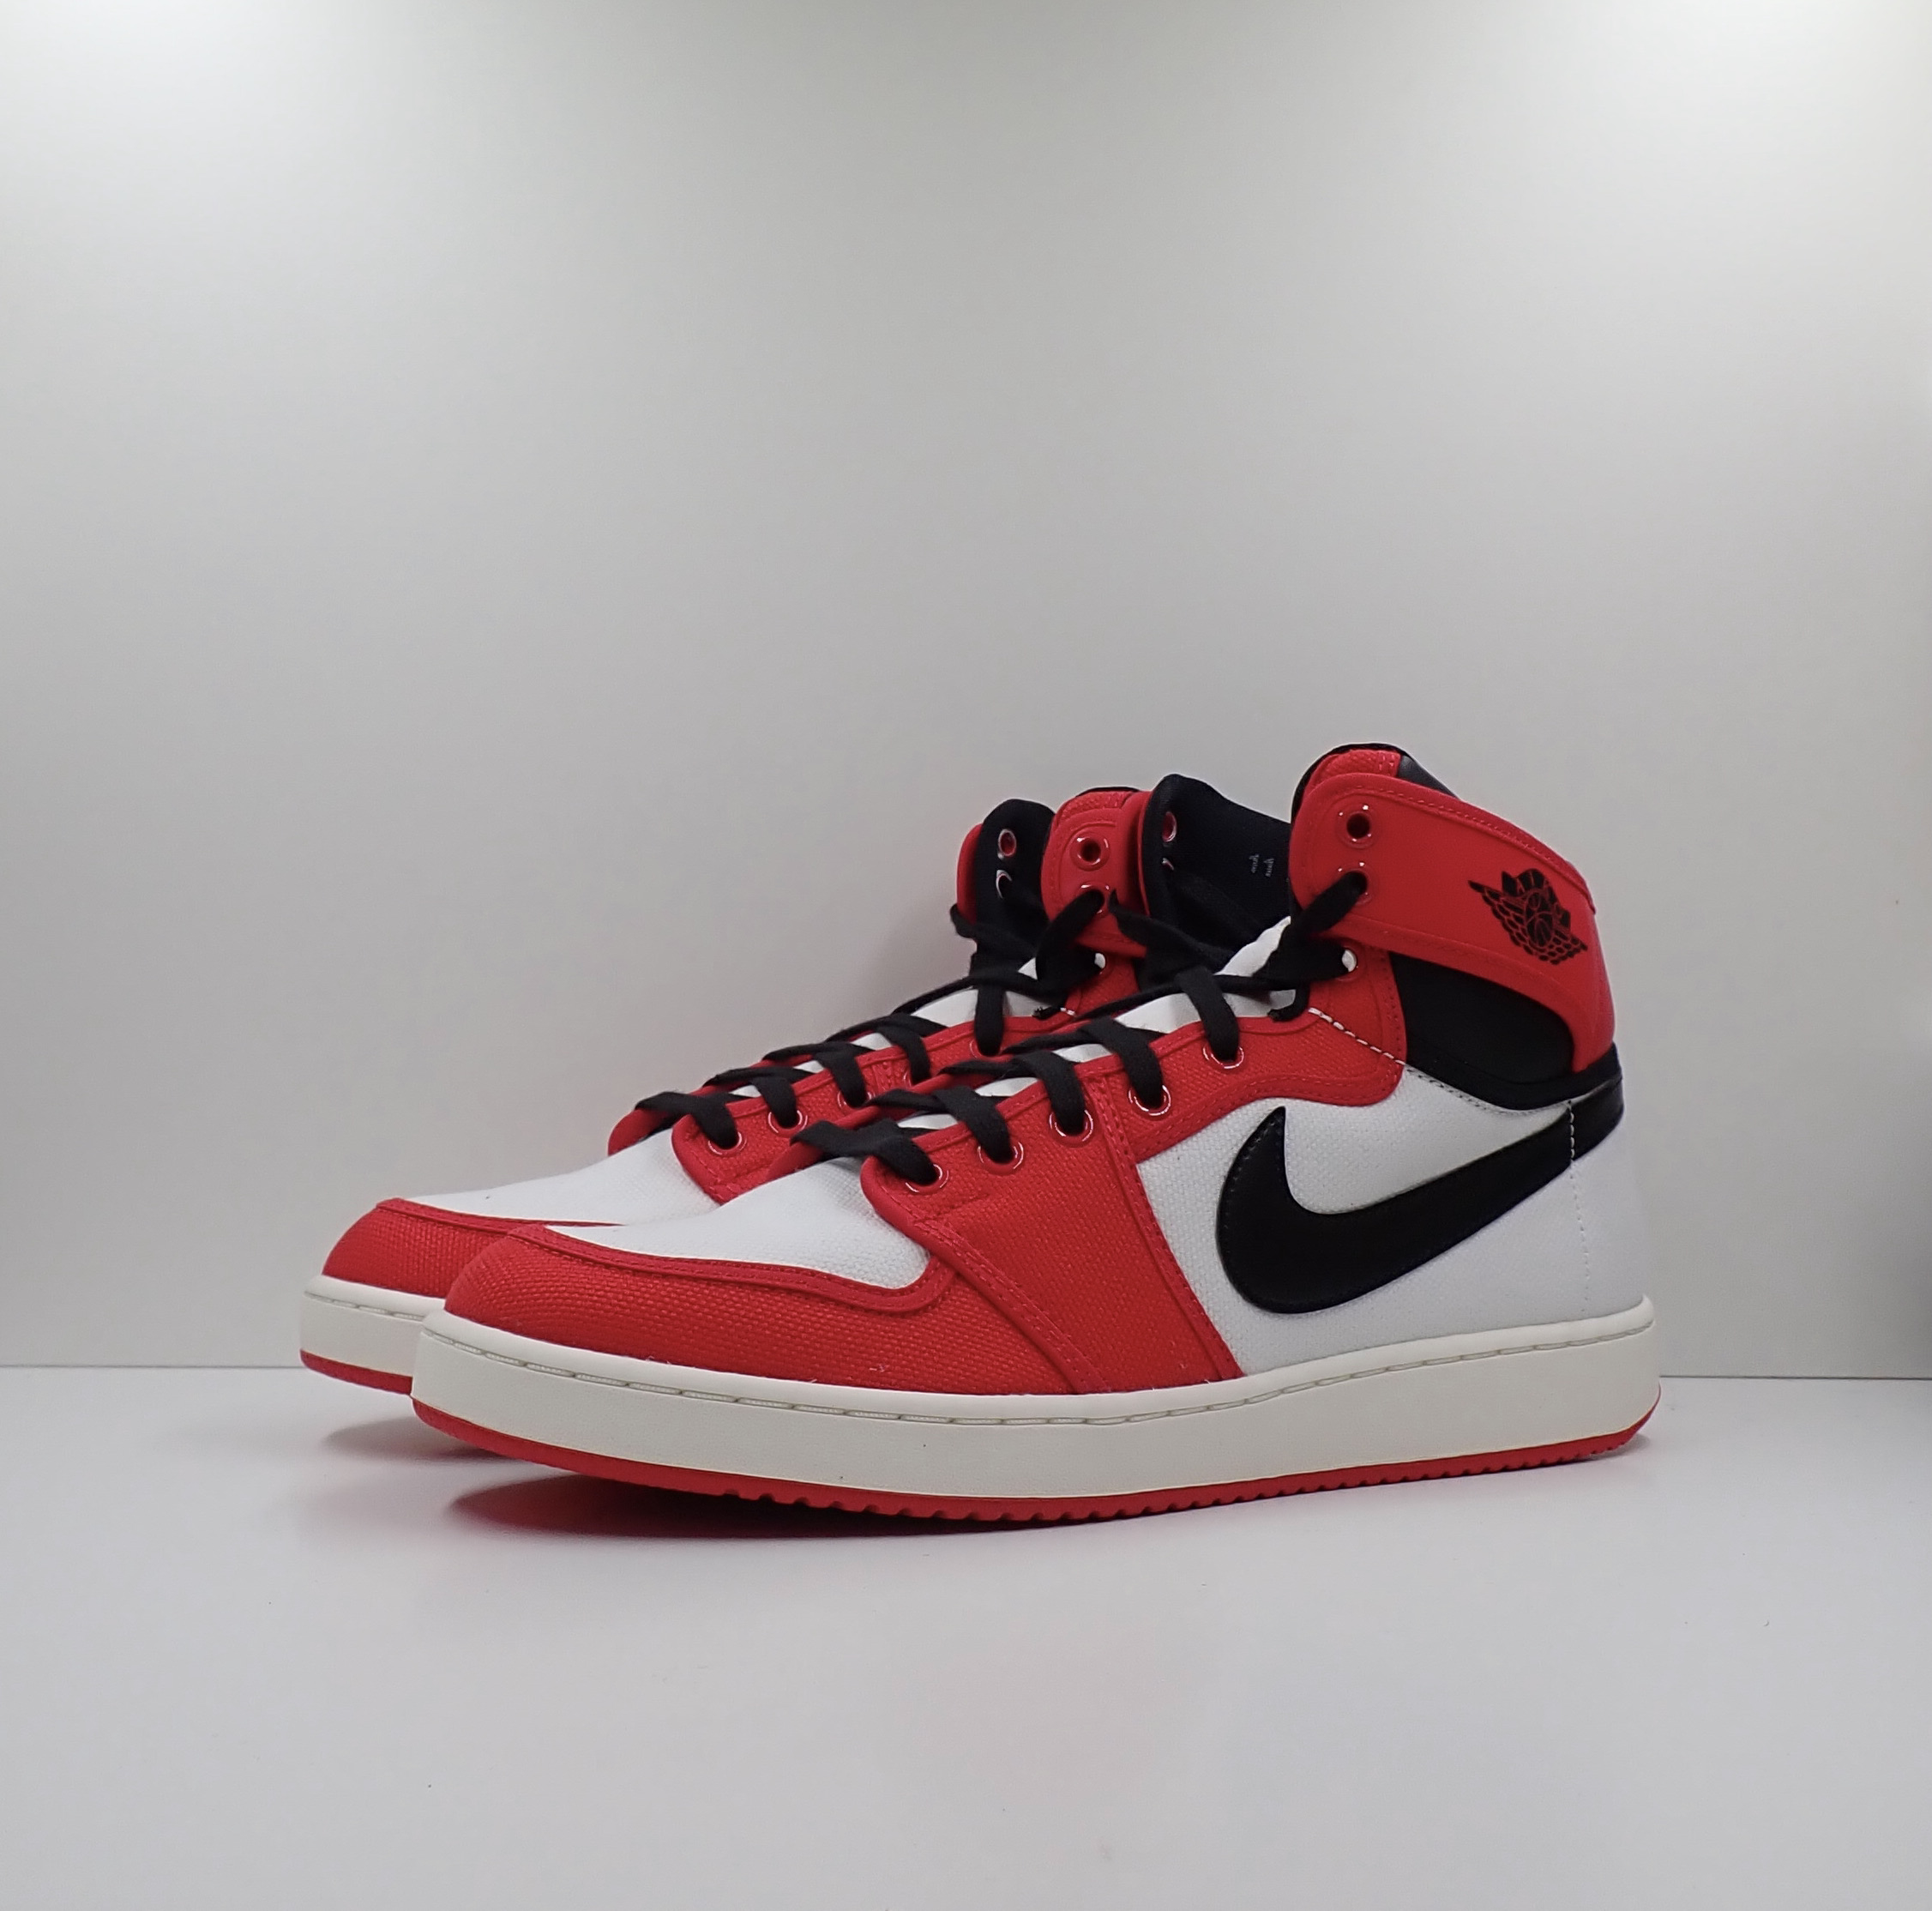 Jordan 1 Retro AJKO Chicago